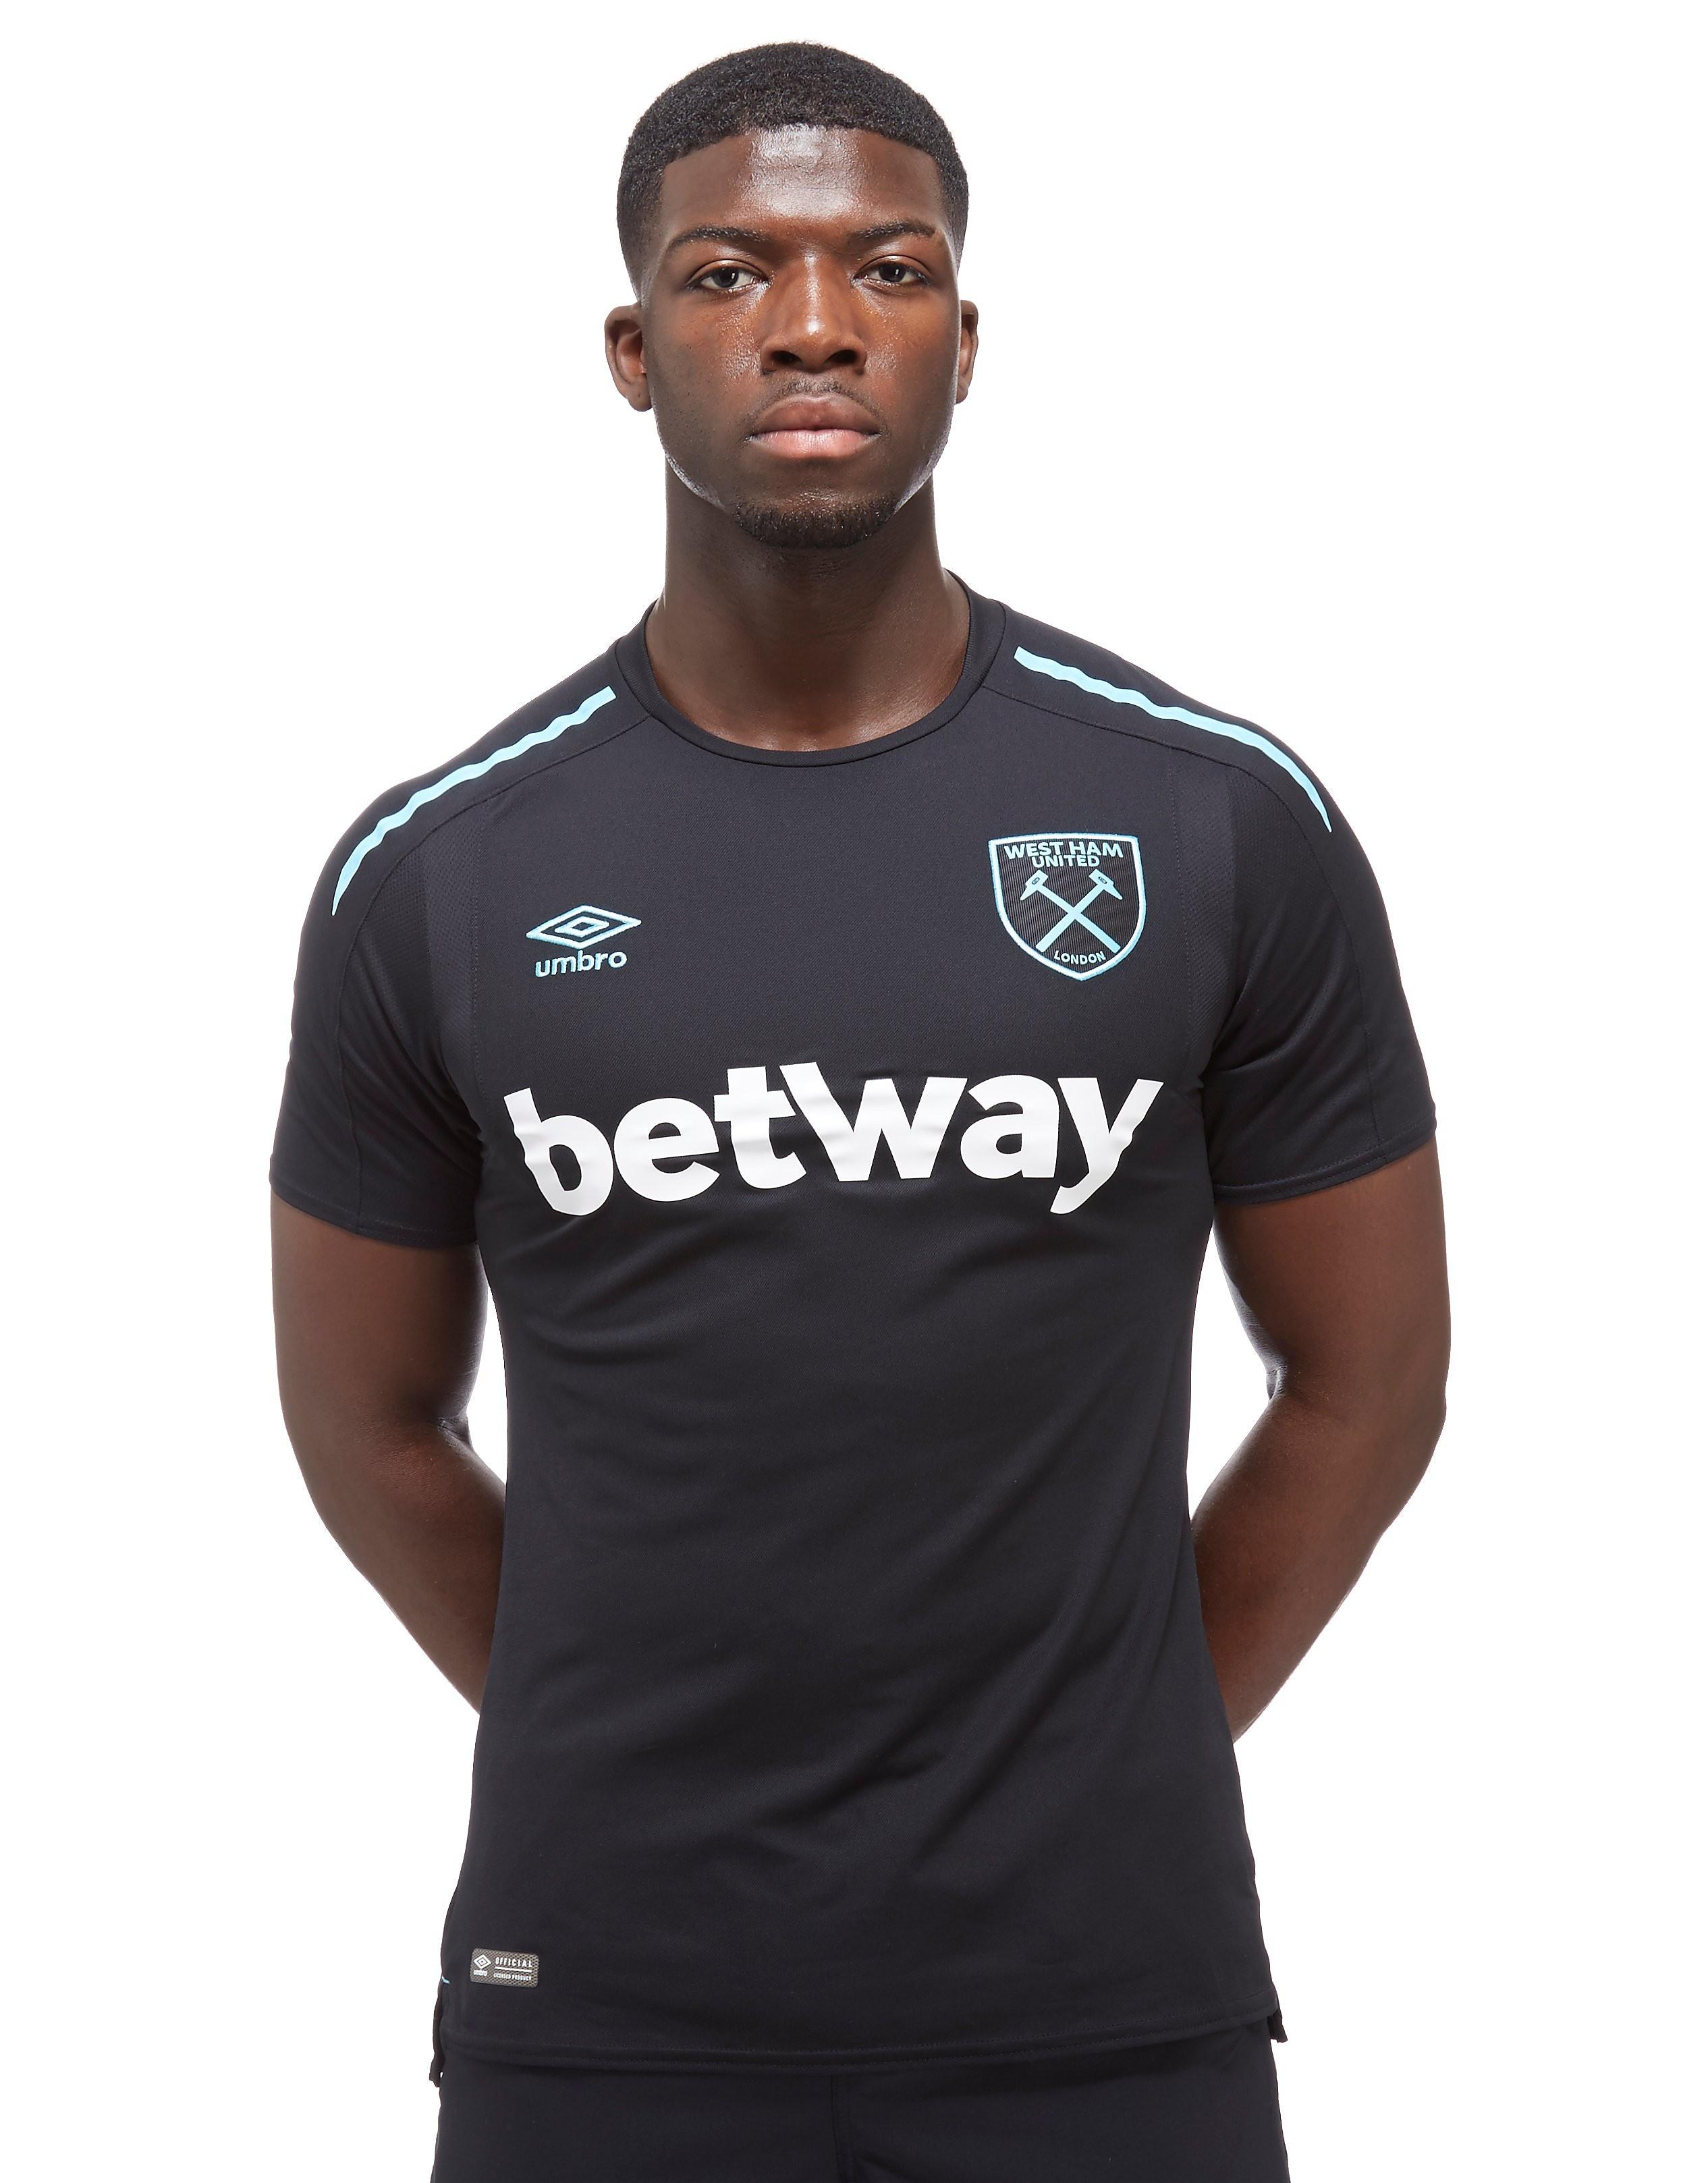 Umbro West Ham United 2017/18 Away Shirt PRE ORDER